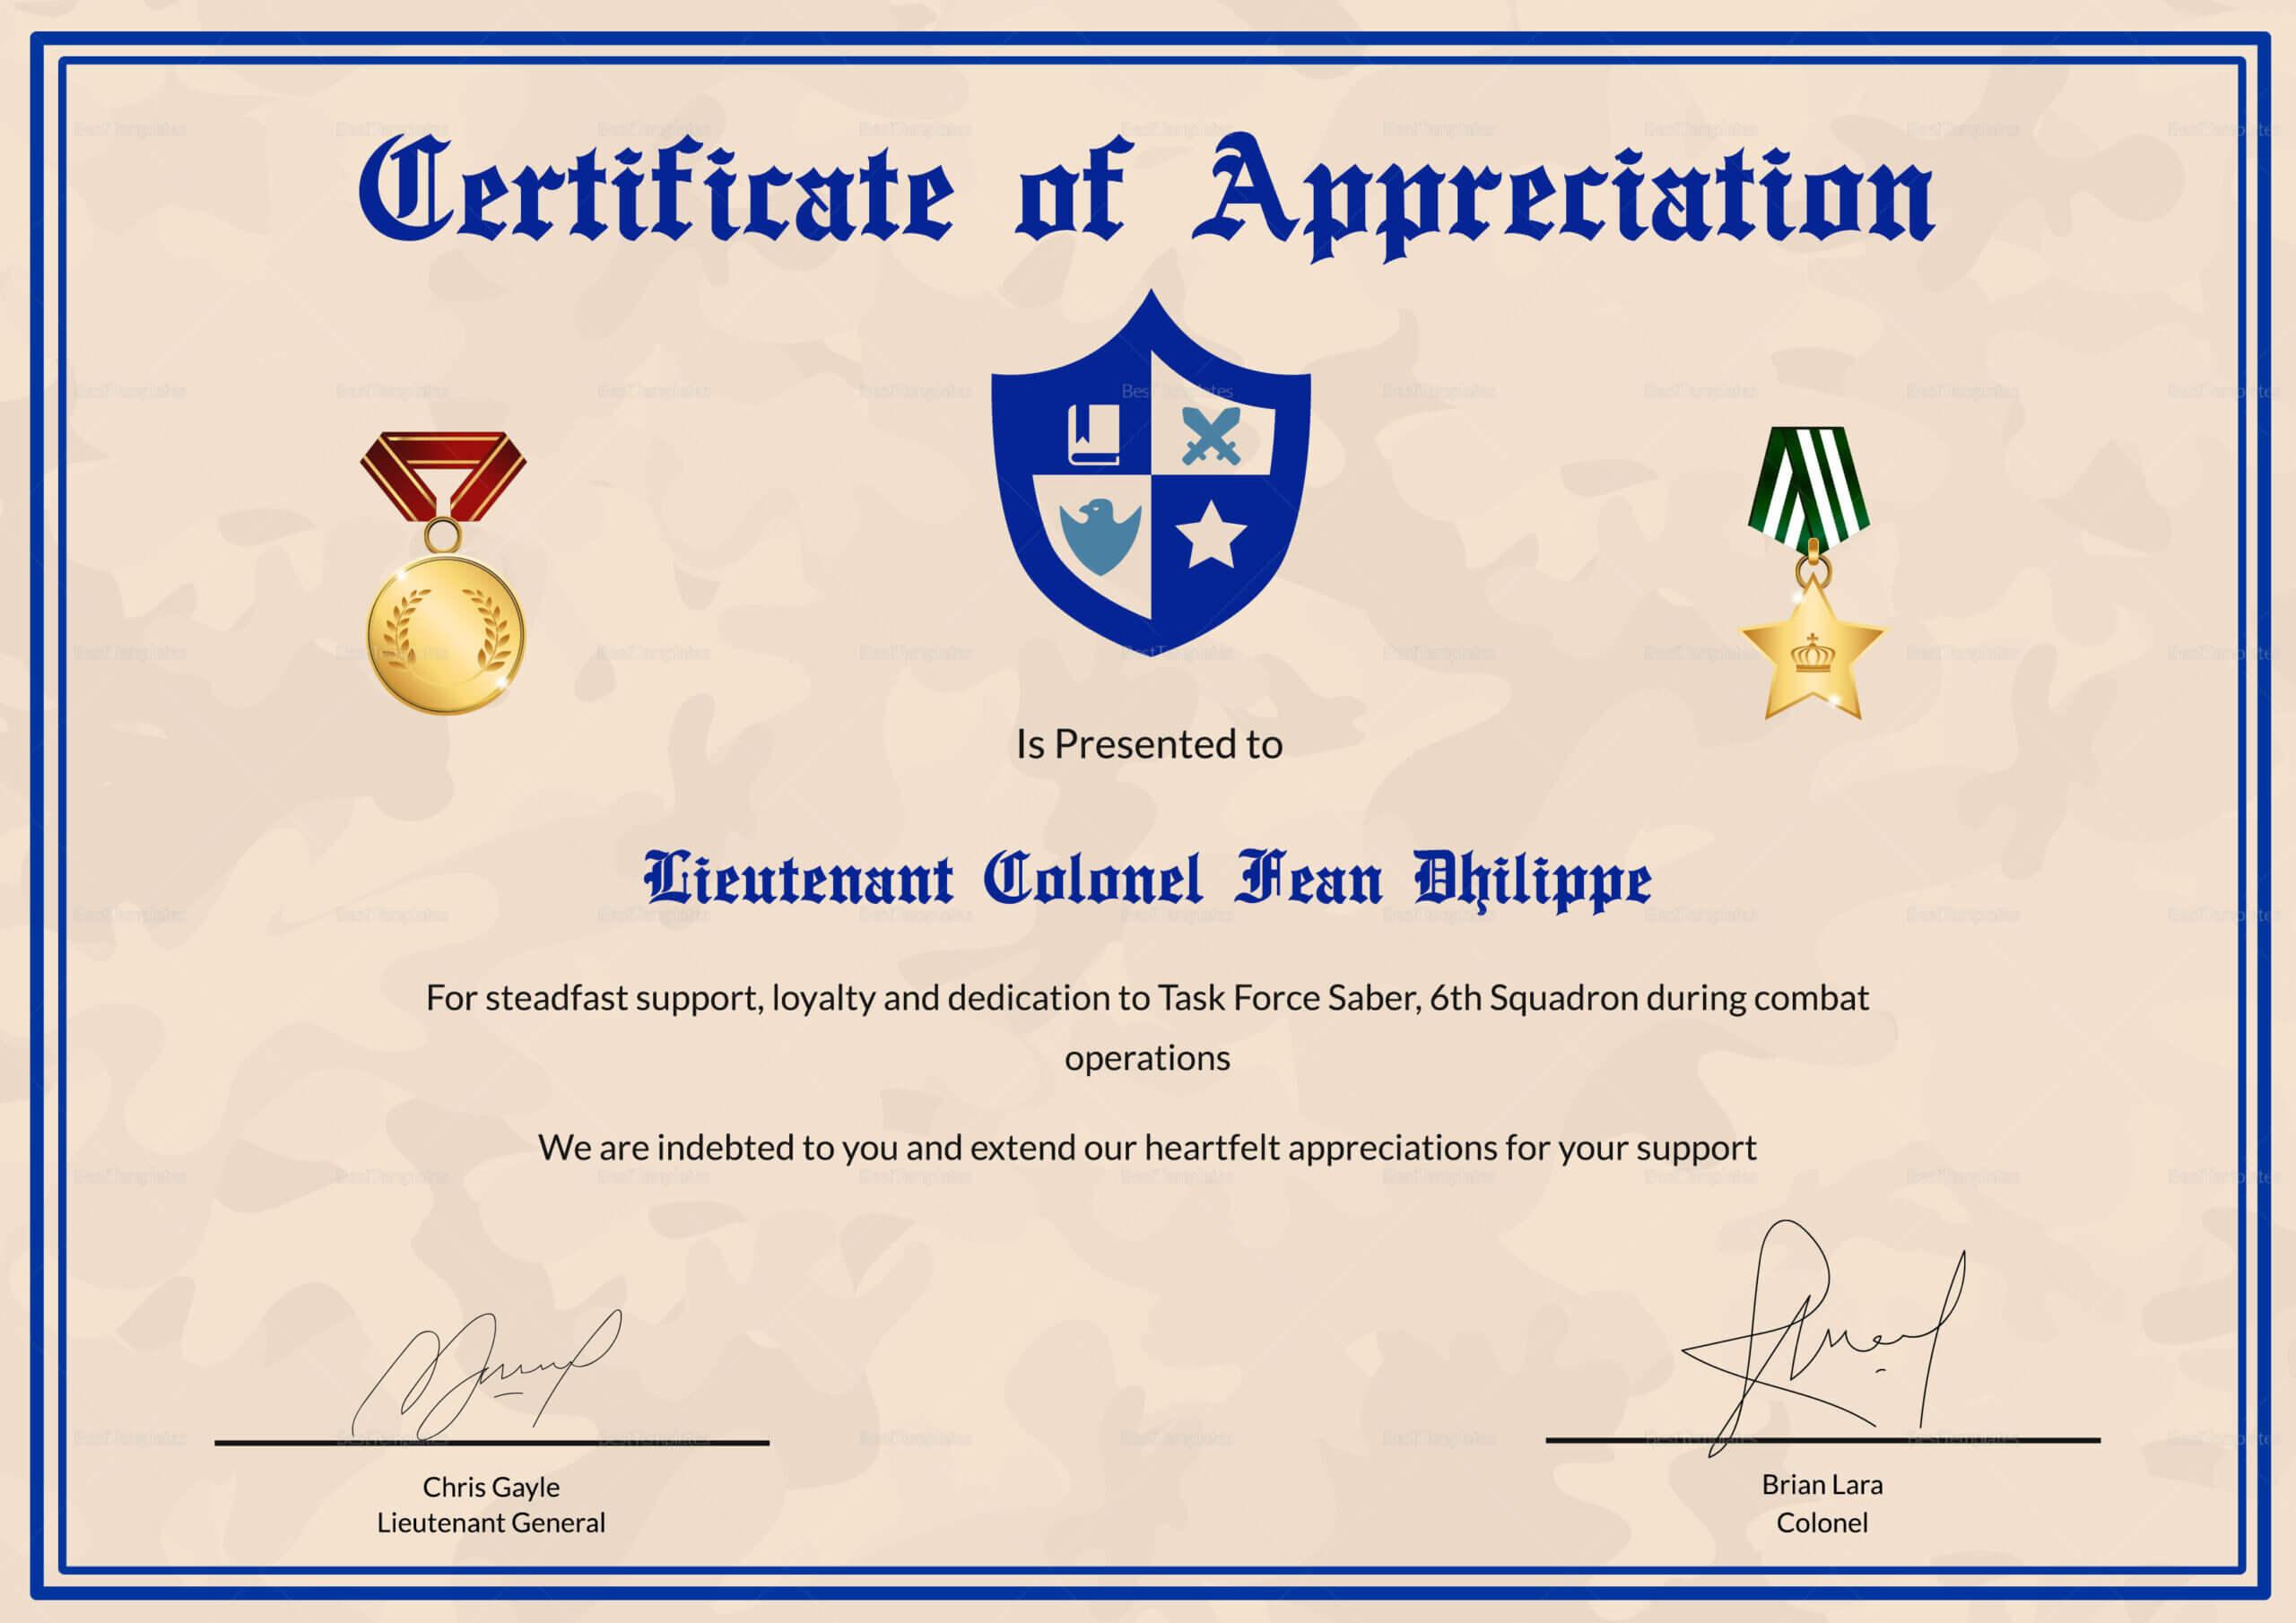 Army Certificate Of Appreciation Template Intended For Army Certificate Of Appreciation Template